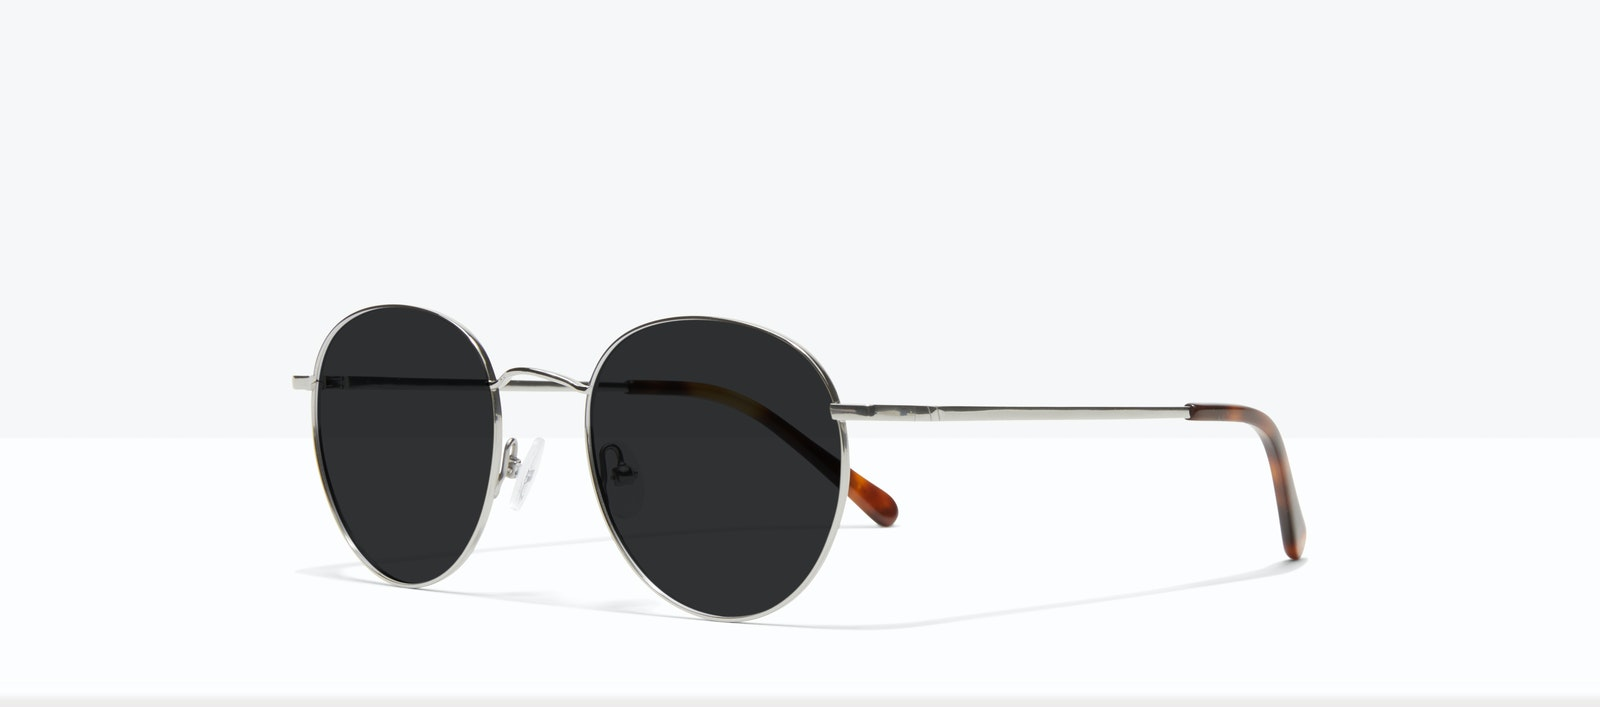 Affordable Fashion Glasses Round Sunglasses Women Calibre Platinum Tilt